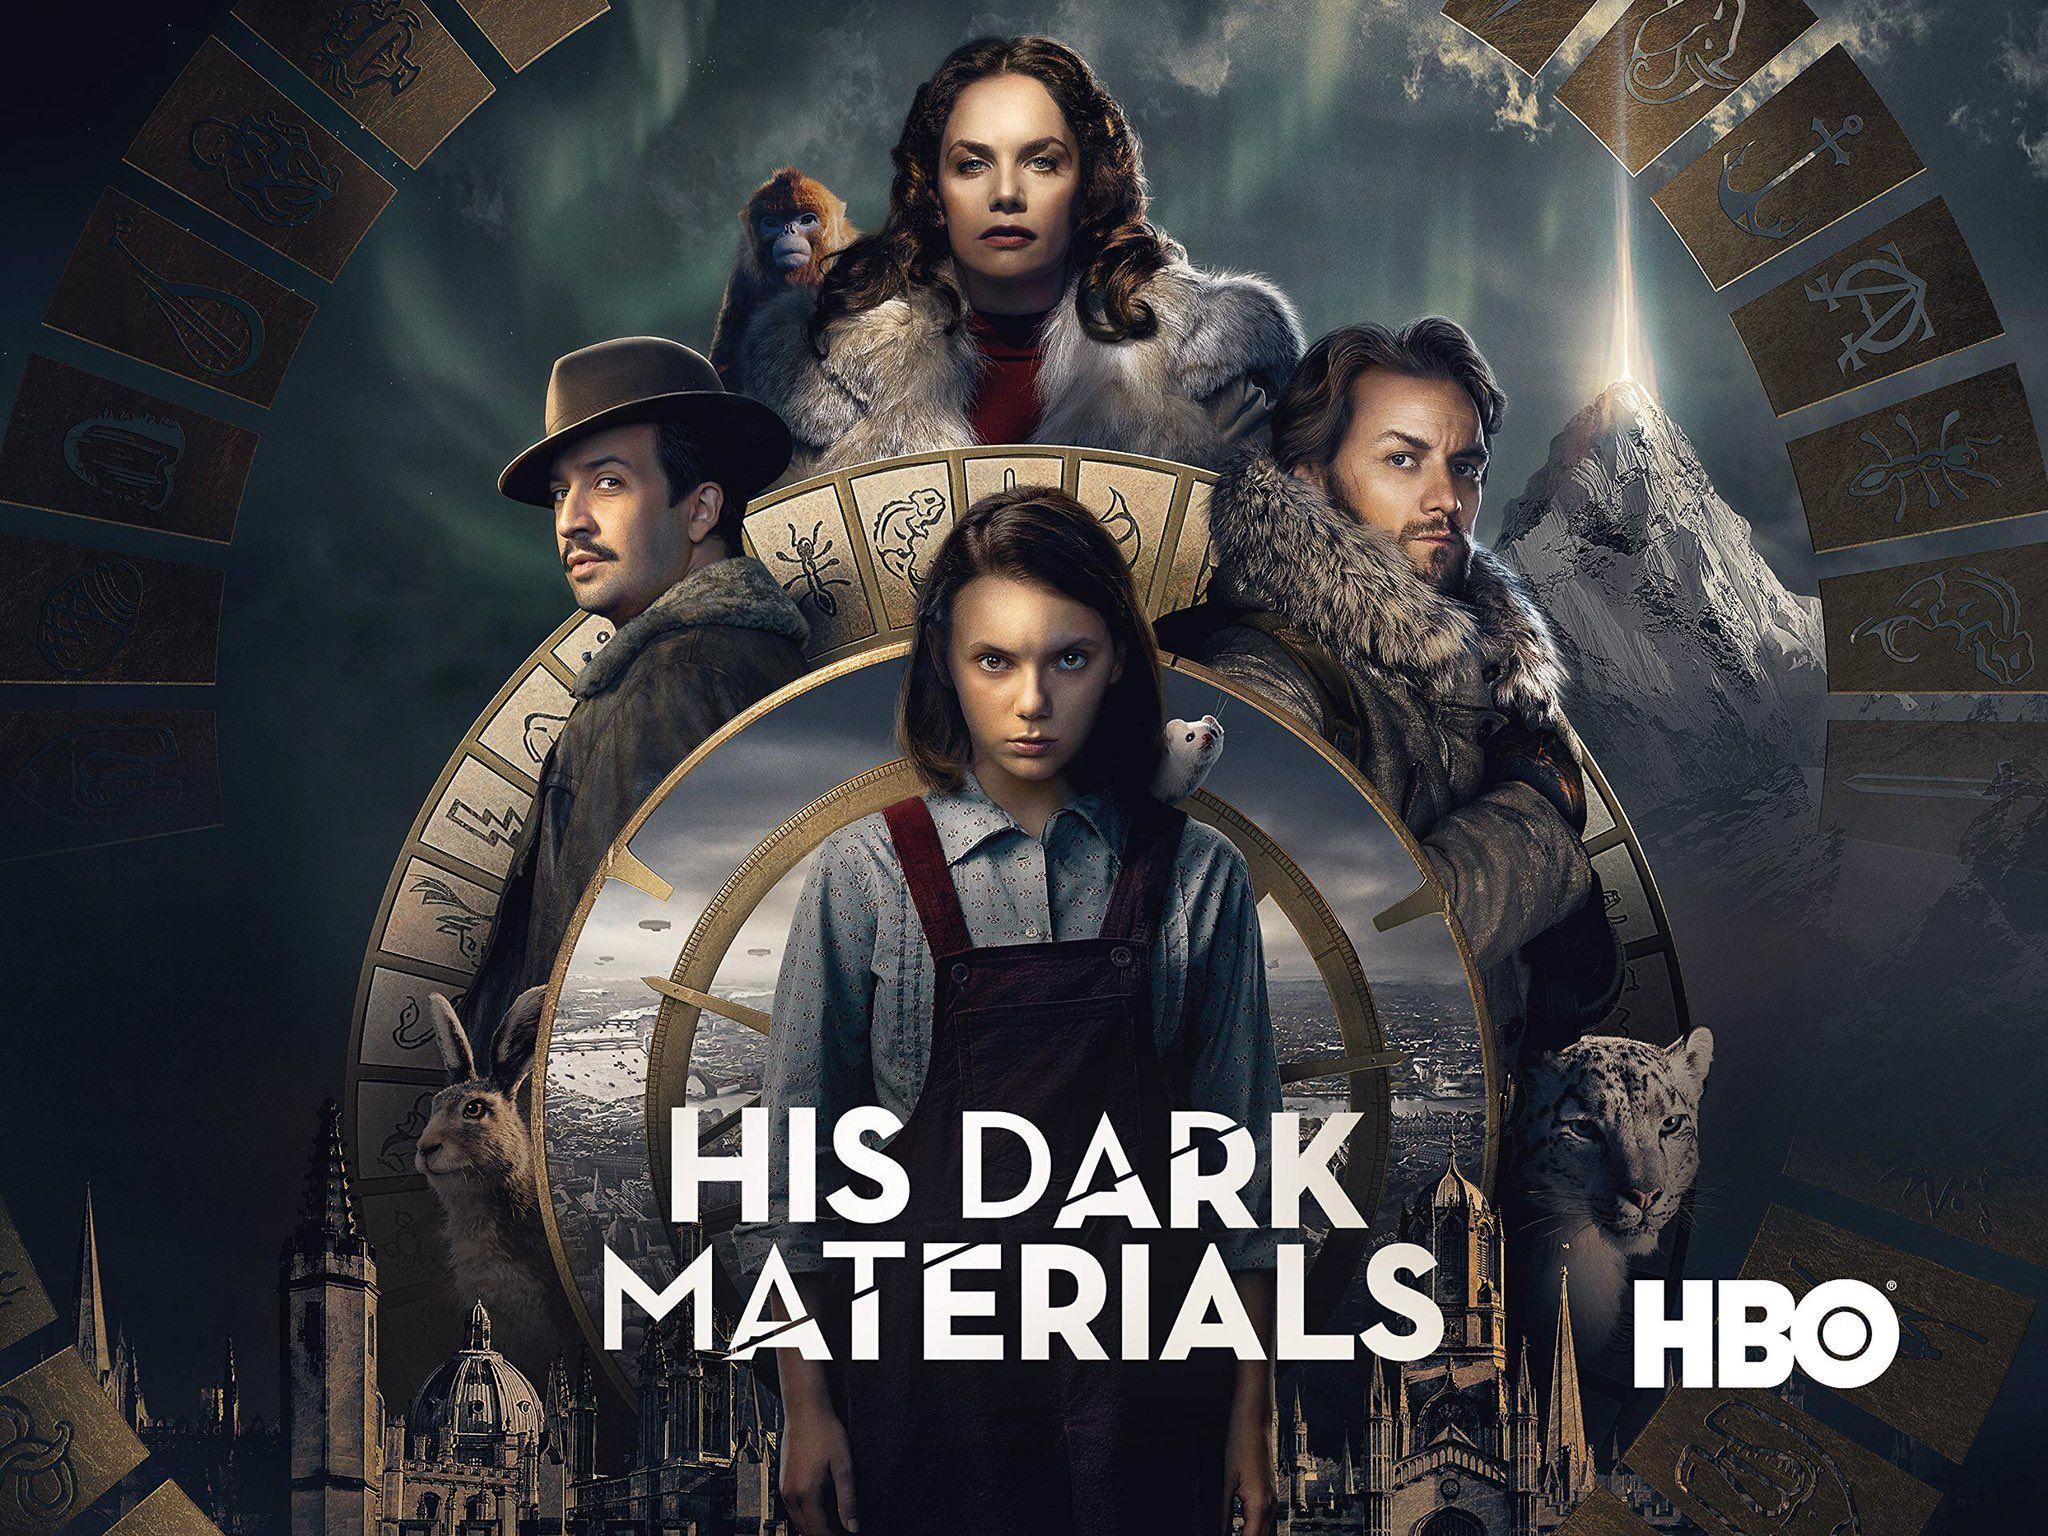 Emeline Letellier On Twitter His Dark Materials Dark Material Top Tv Shows